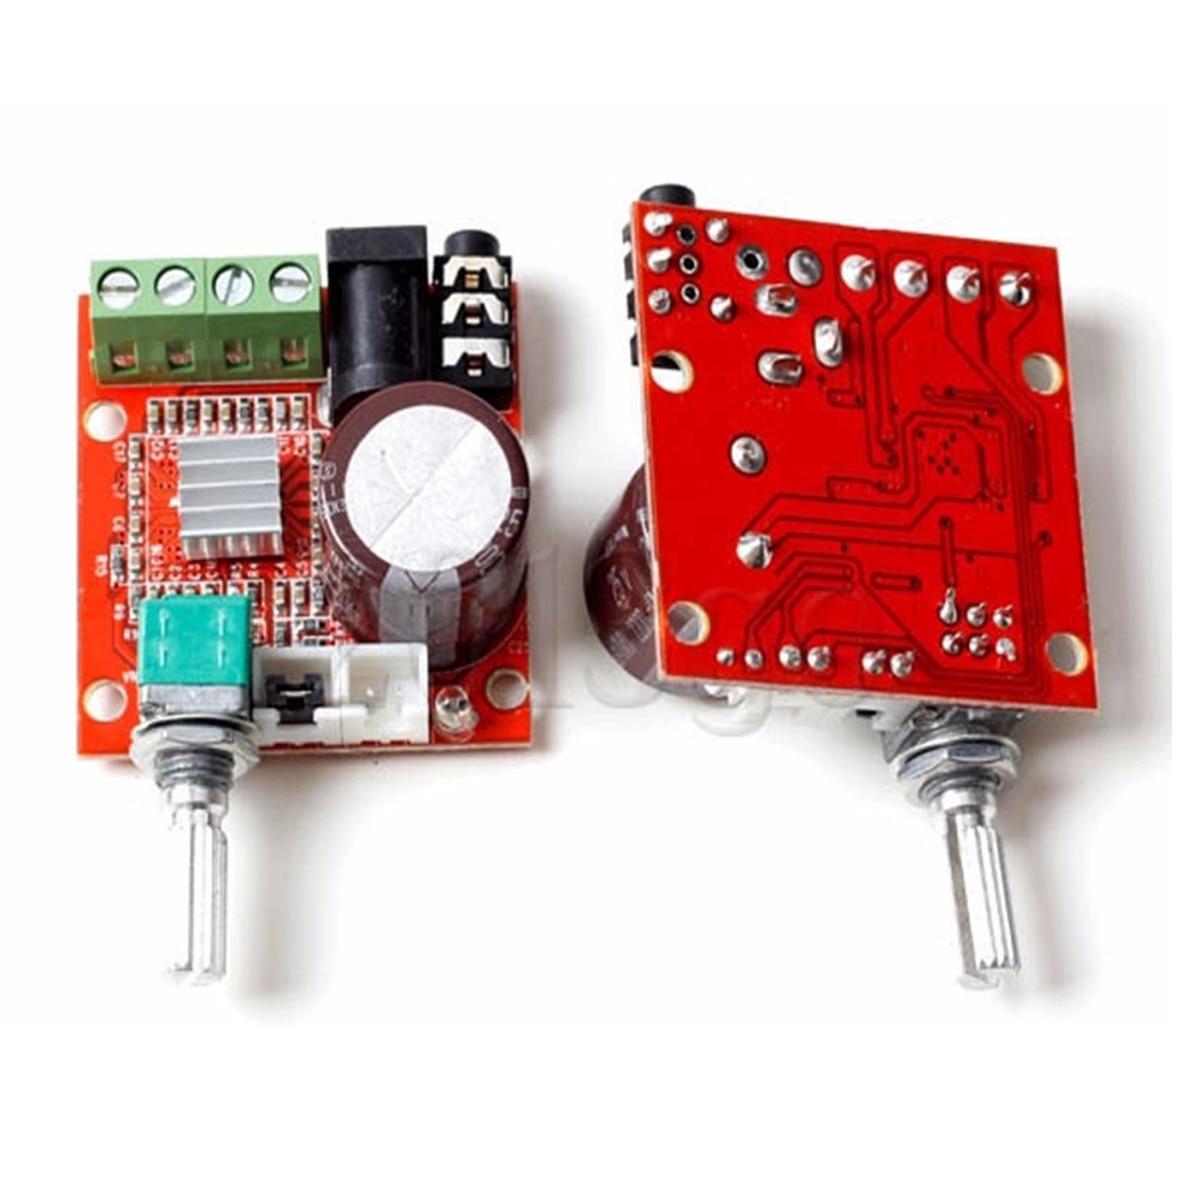 Buy Leory Super Slim 15w Pam8610 Class D Digital Details About 12v Mini Hifi Audio Stereo Amplifier Circuit 1pcs Hi Fi Board Dual Channel